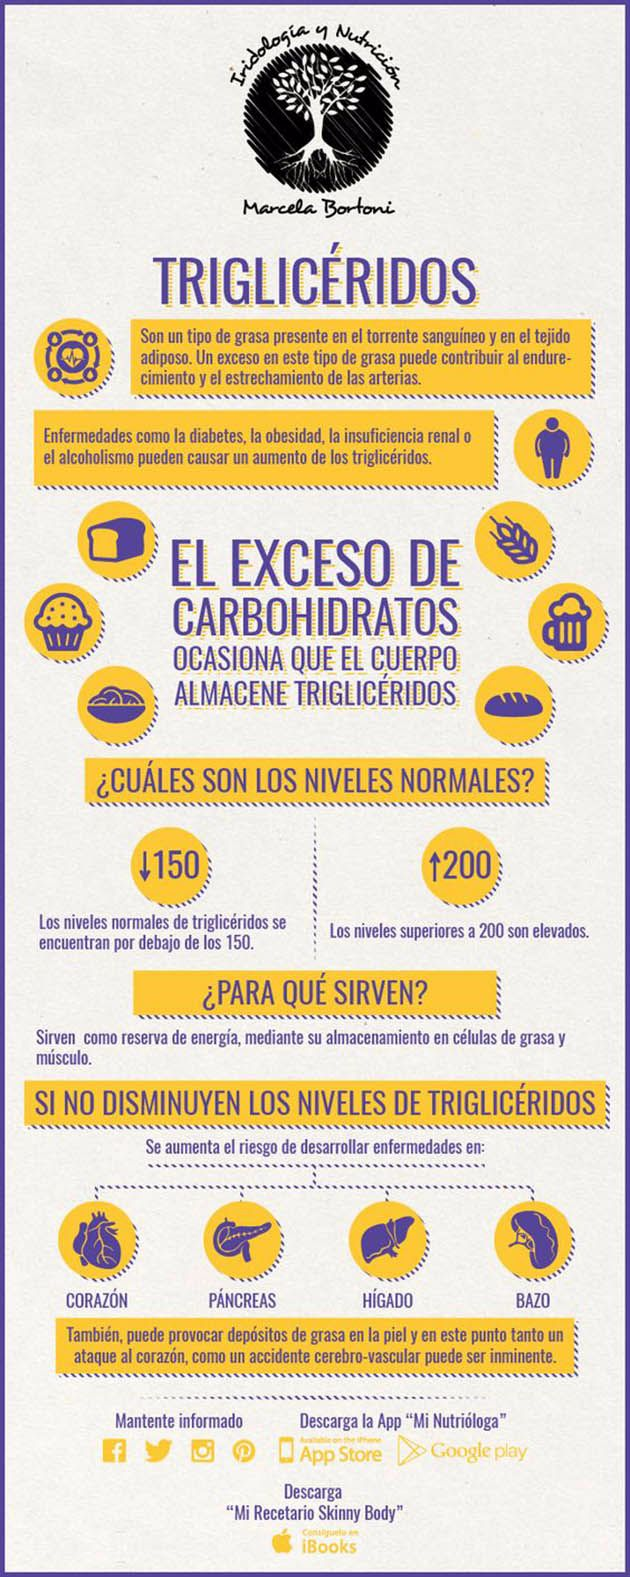 infografía trigliceridos